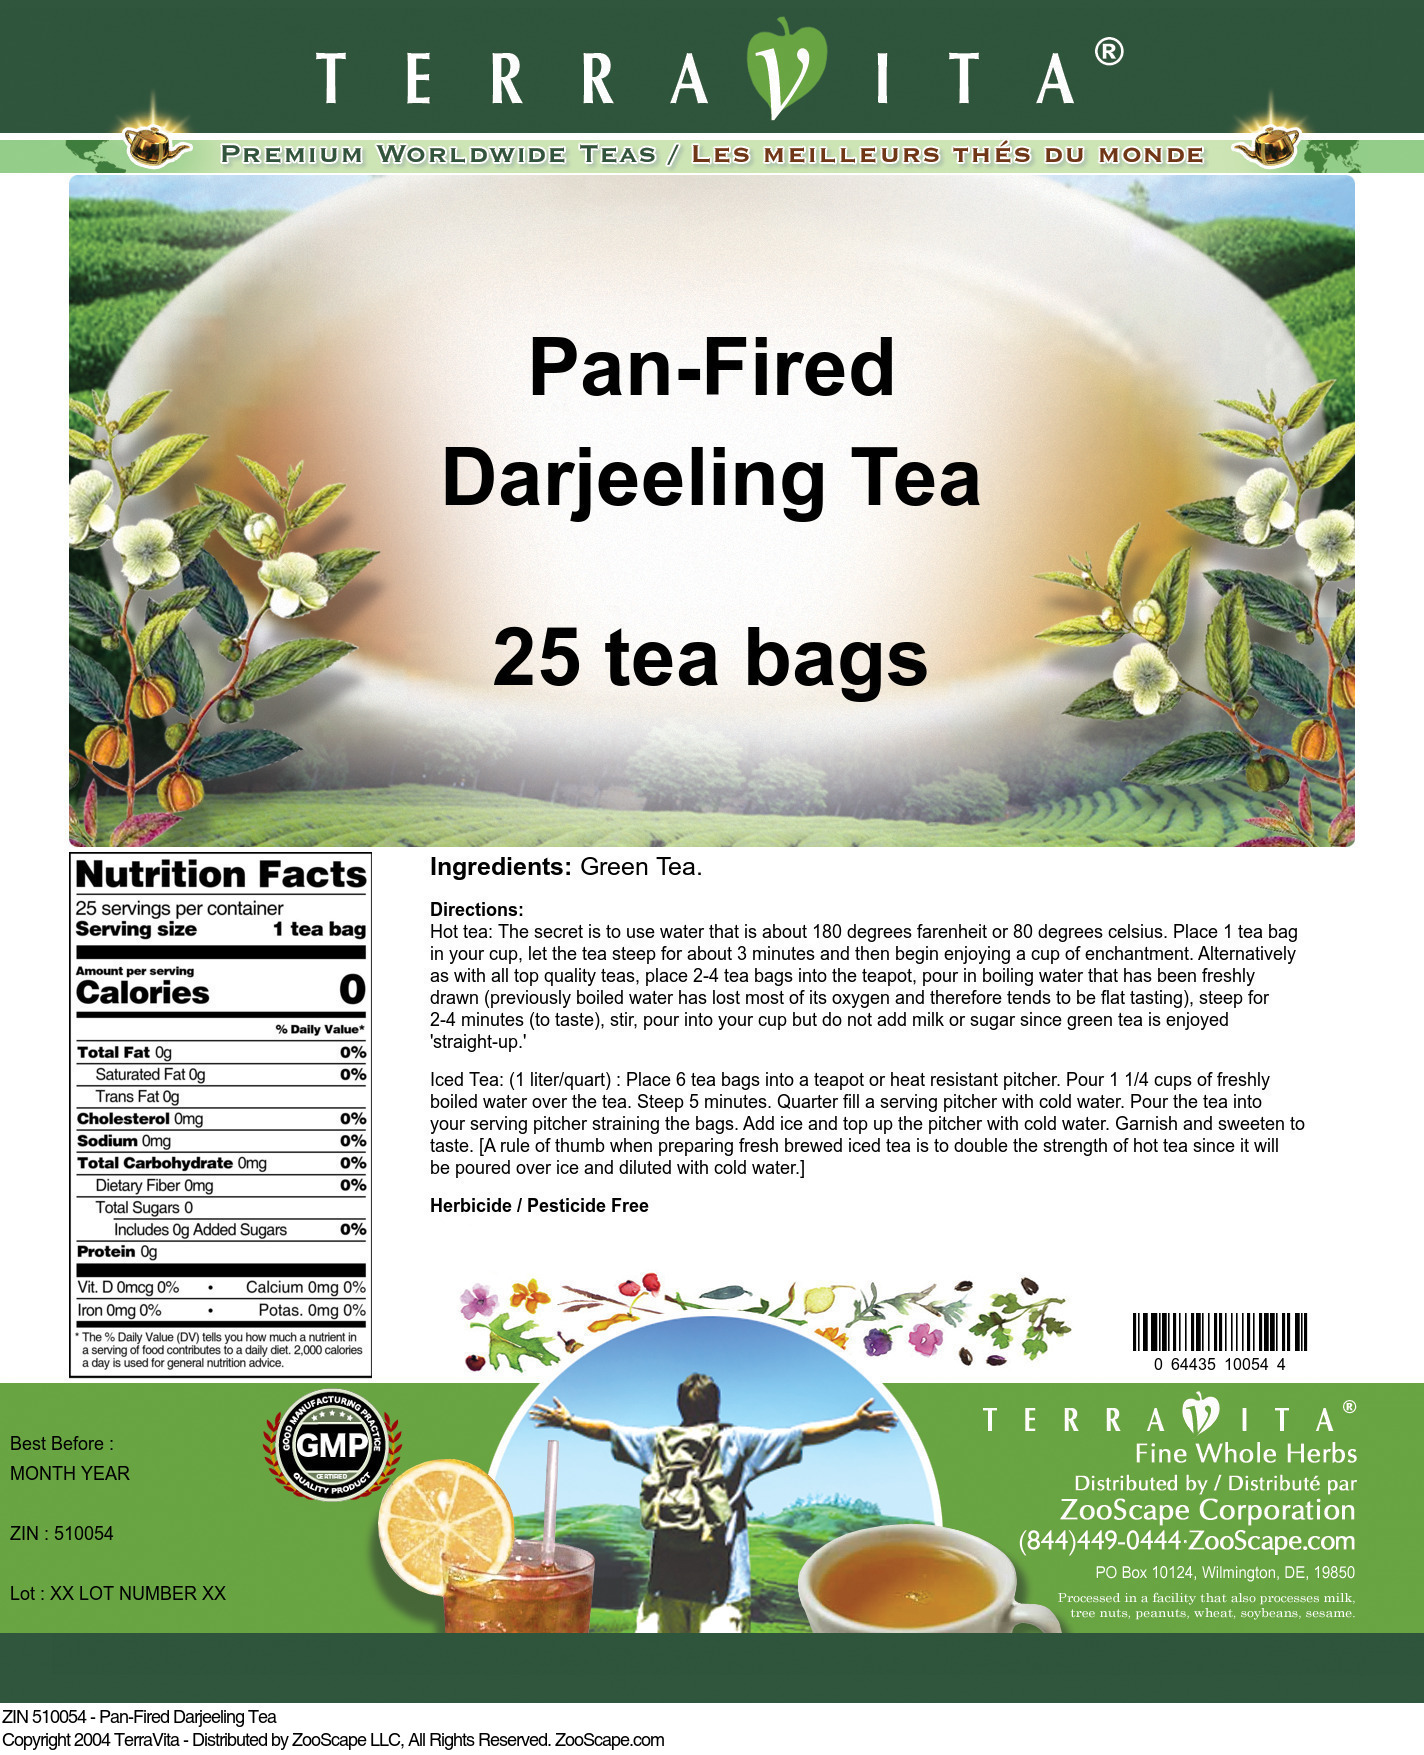 Pan-Fired Darjeeling Tea